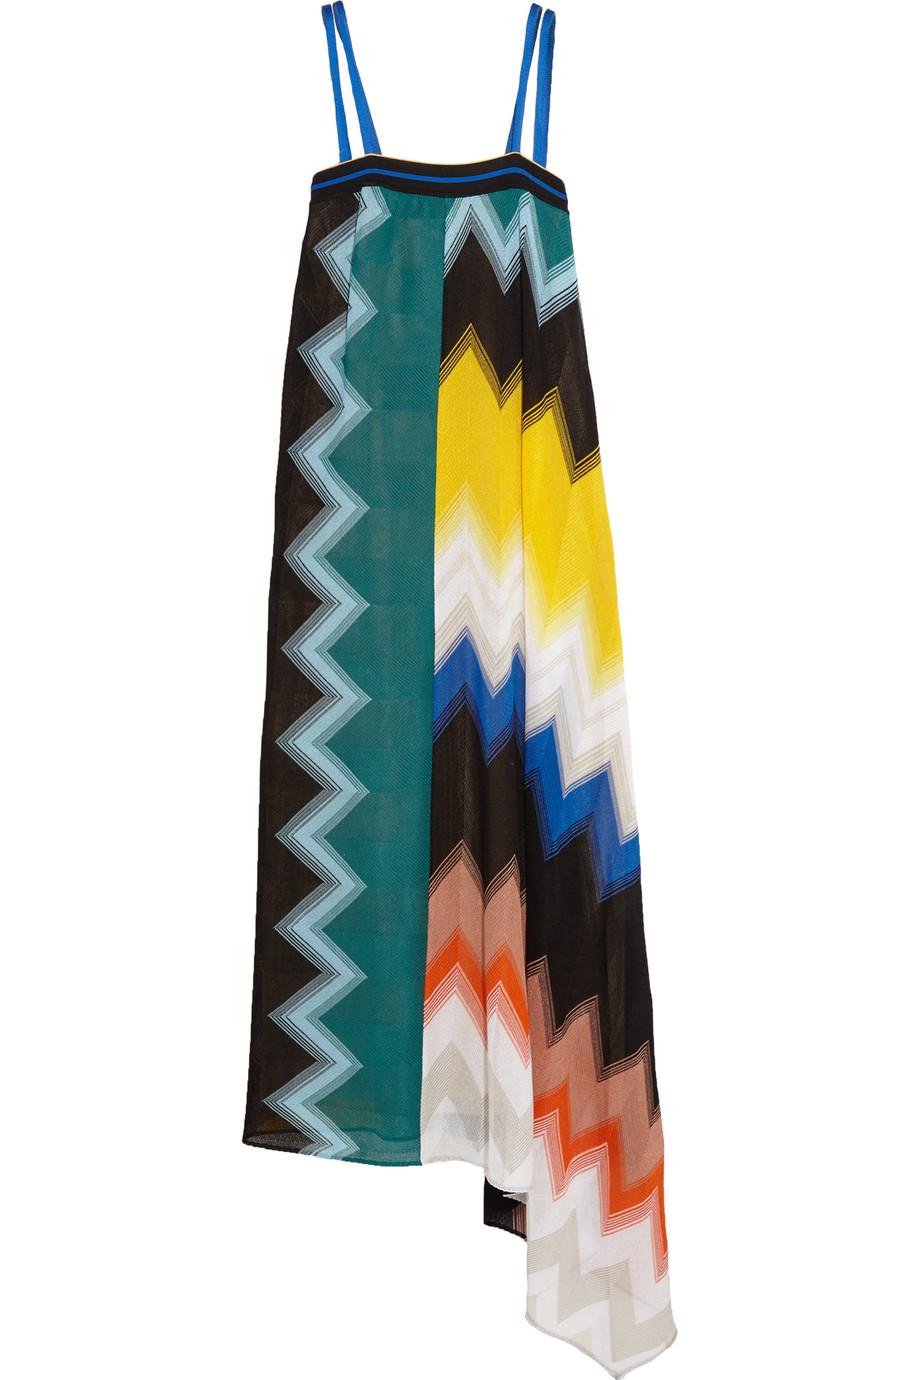 Missoni Crochet-Knit Dress, Size: 38